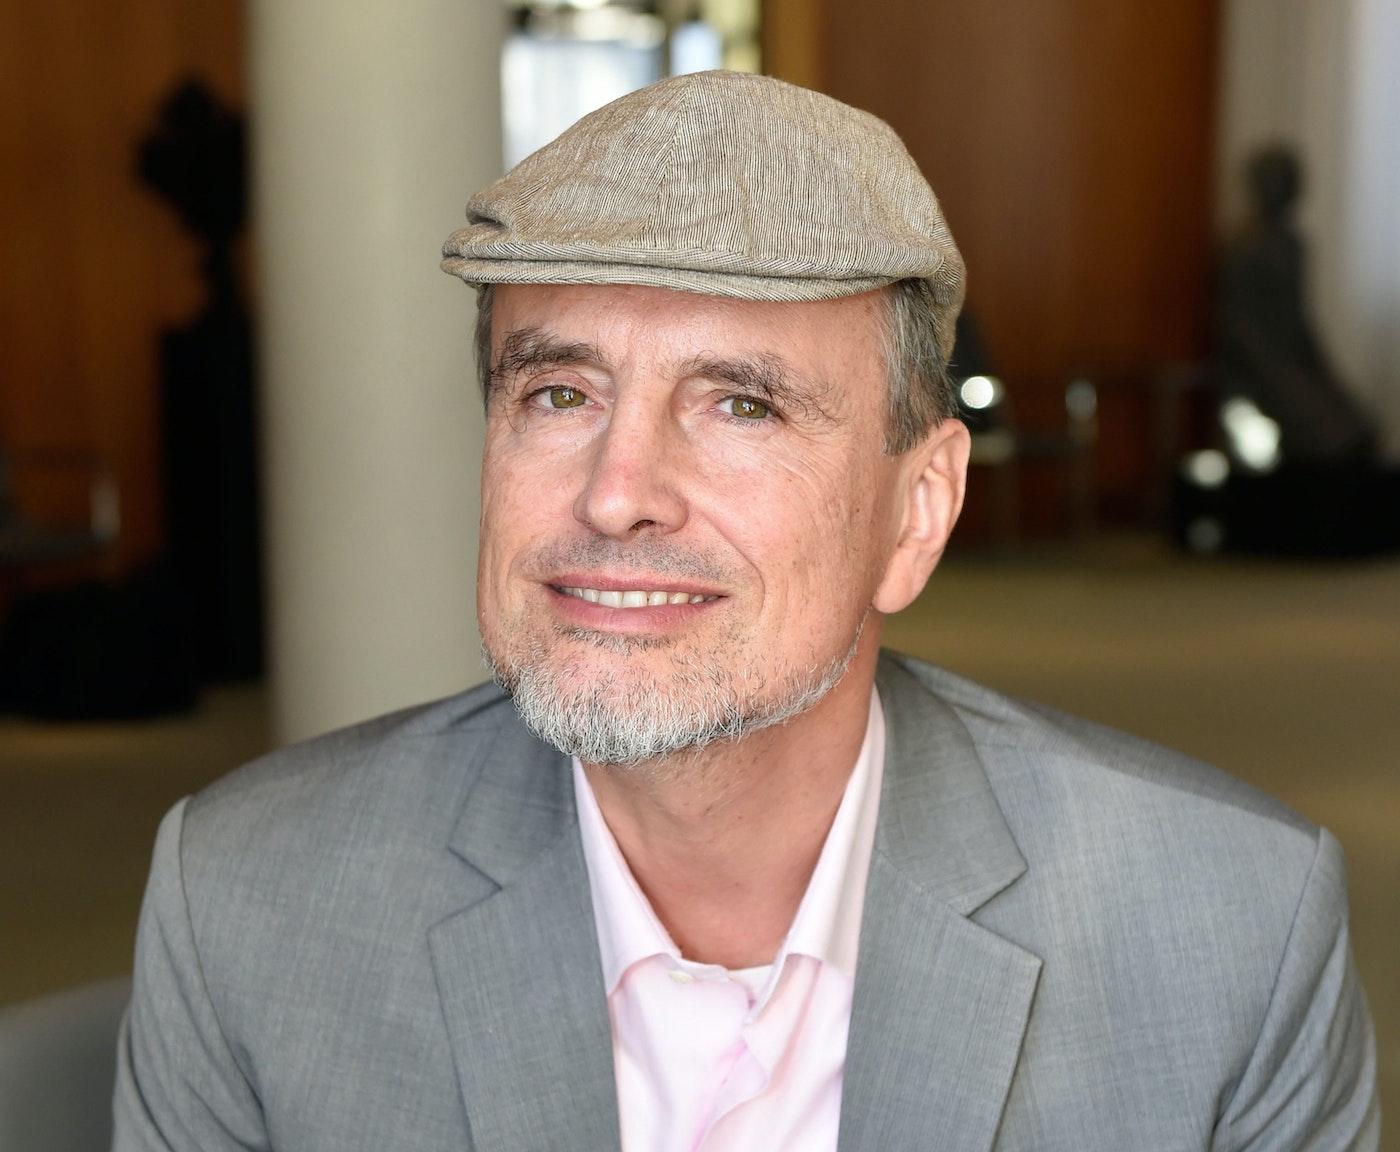 Jürgen Schmidhuber at the International Health Forum, 2015.